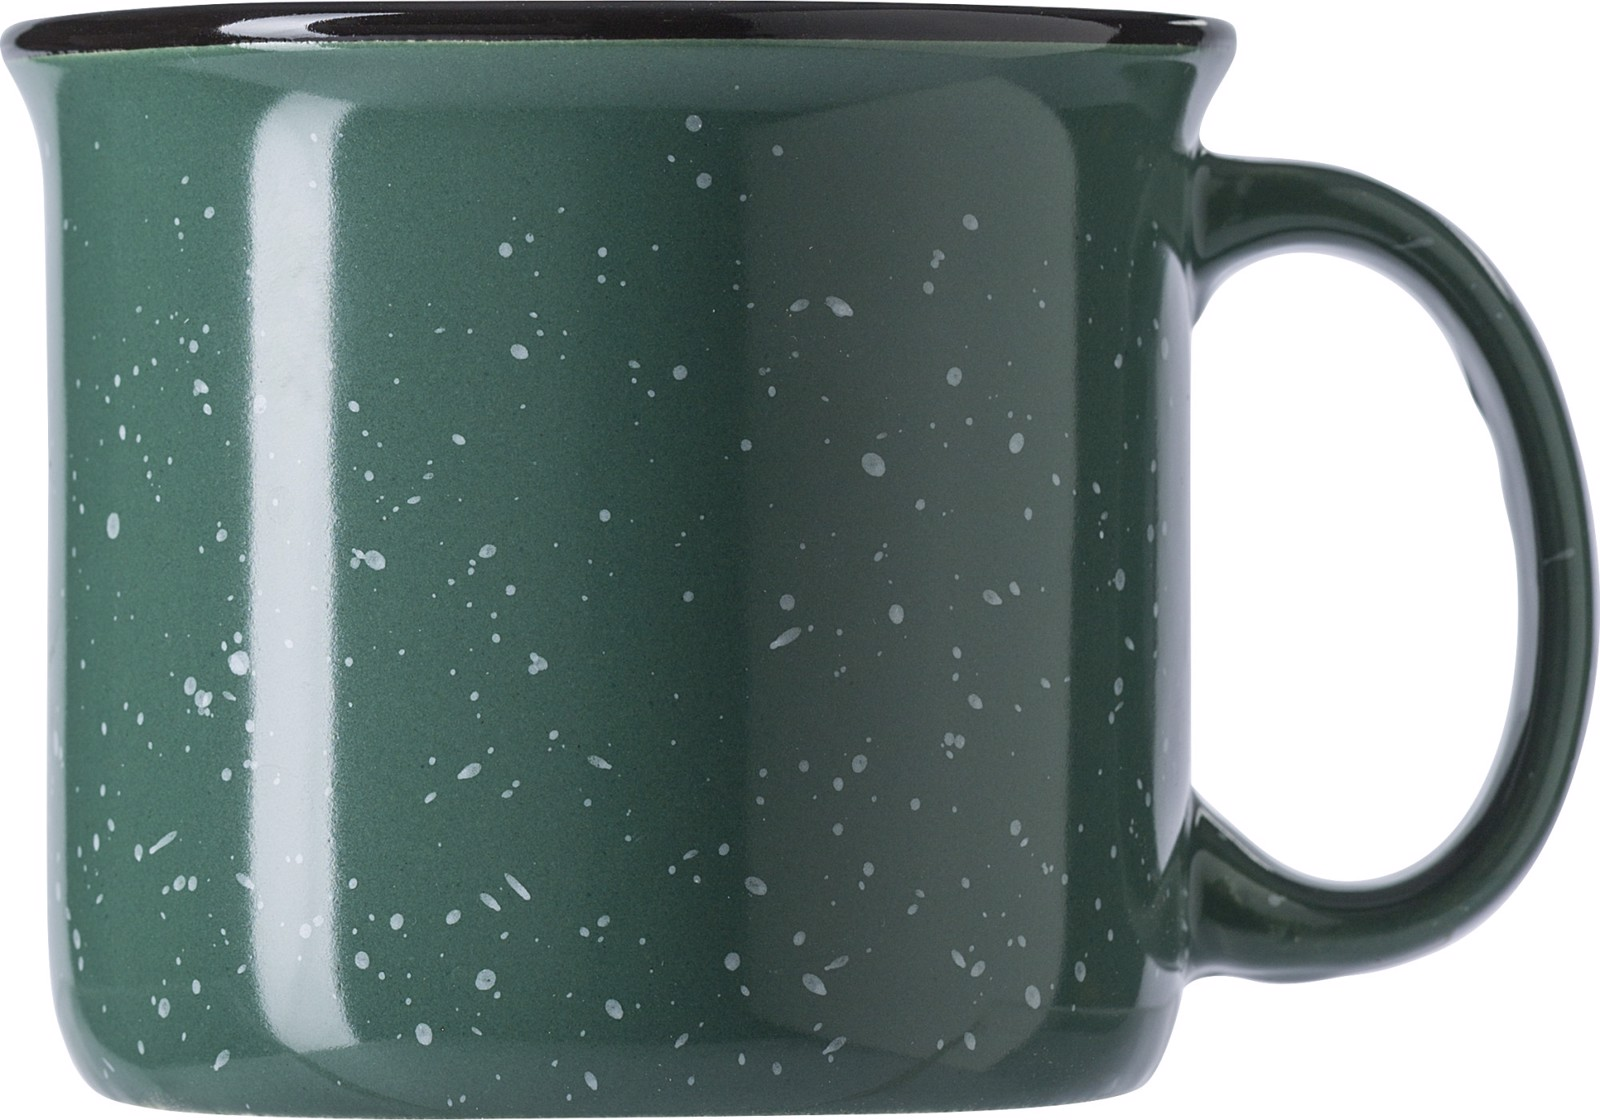 Ceramic mug - Green